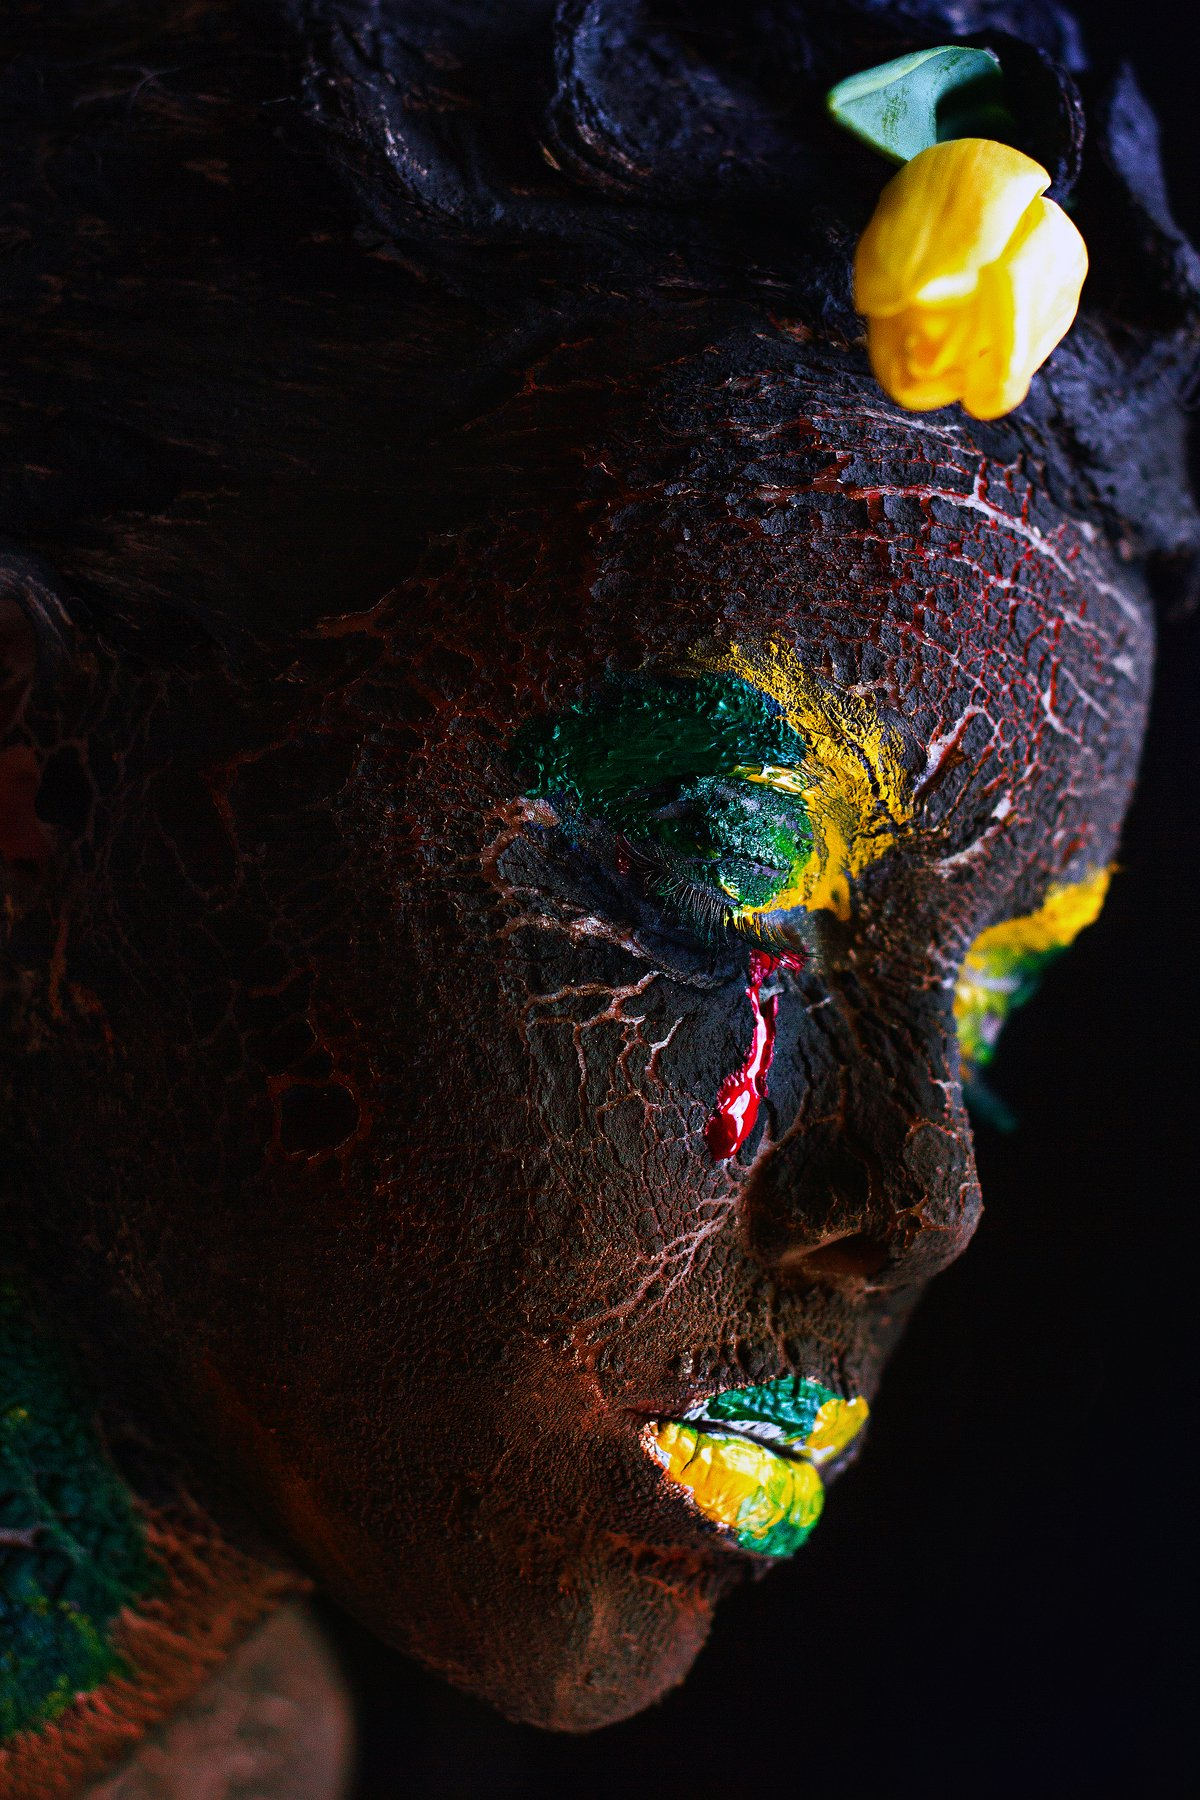 people, girl, portrait, art, planet, life, texture, relief, eye, neck, paint, makeup, body art, black, opinion, creative, Ковалёв Иван